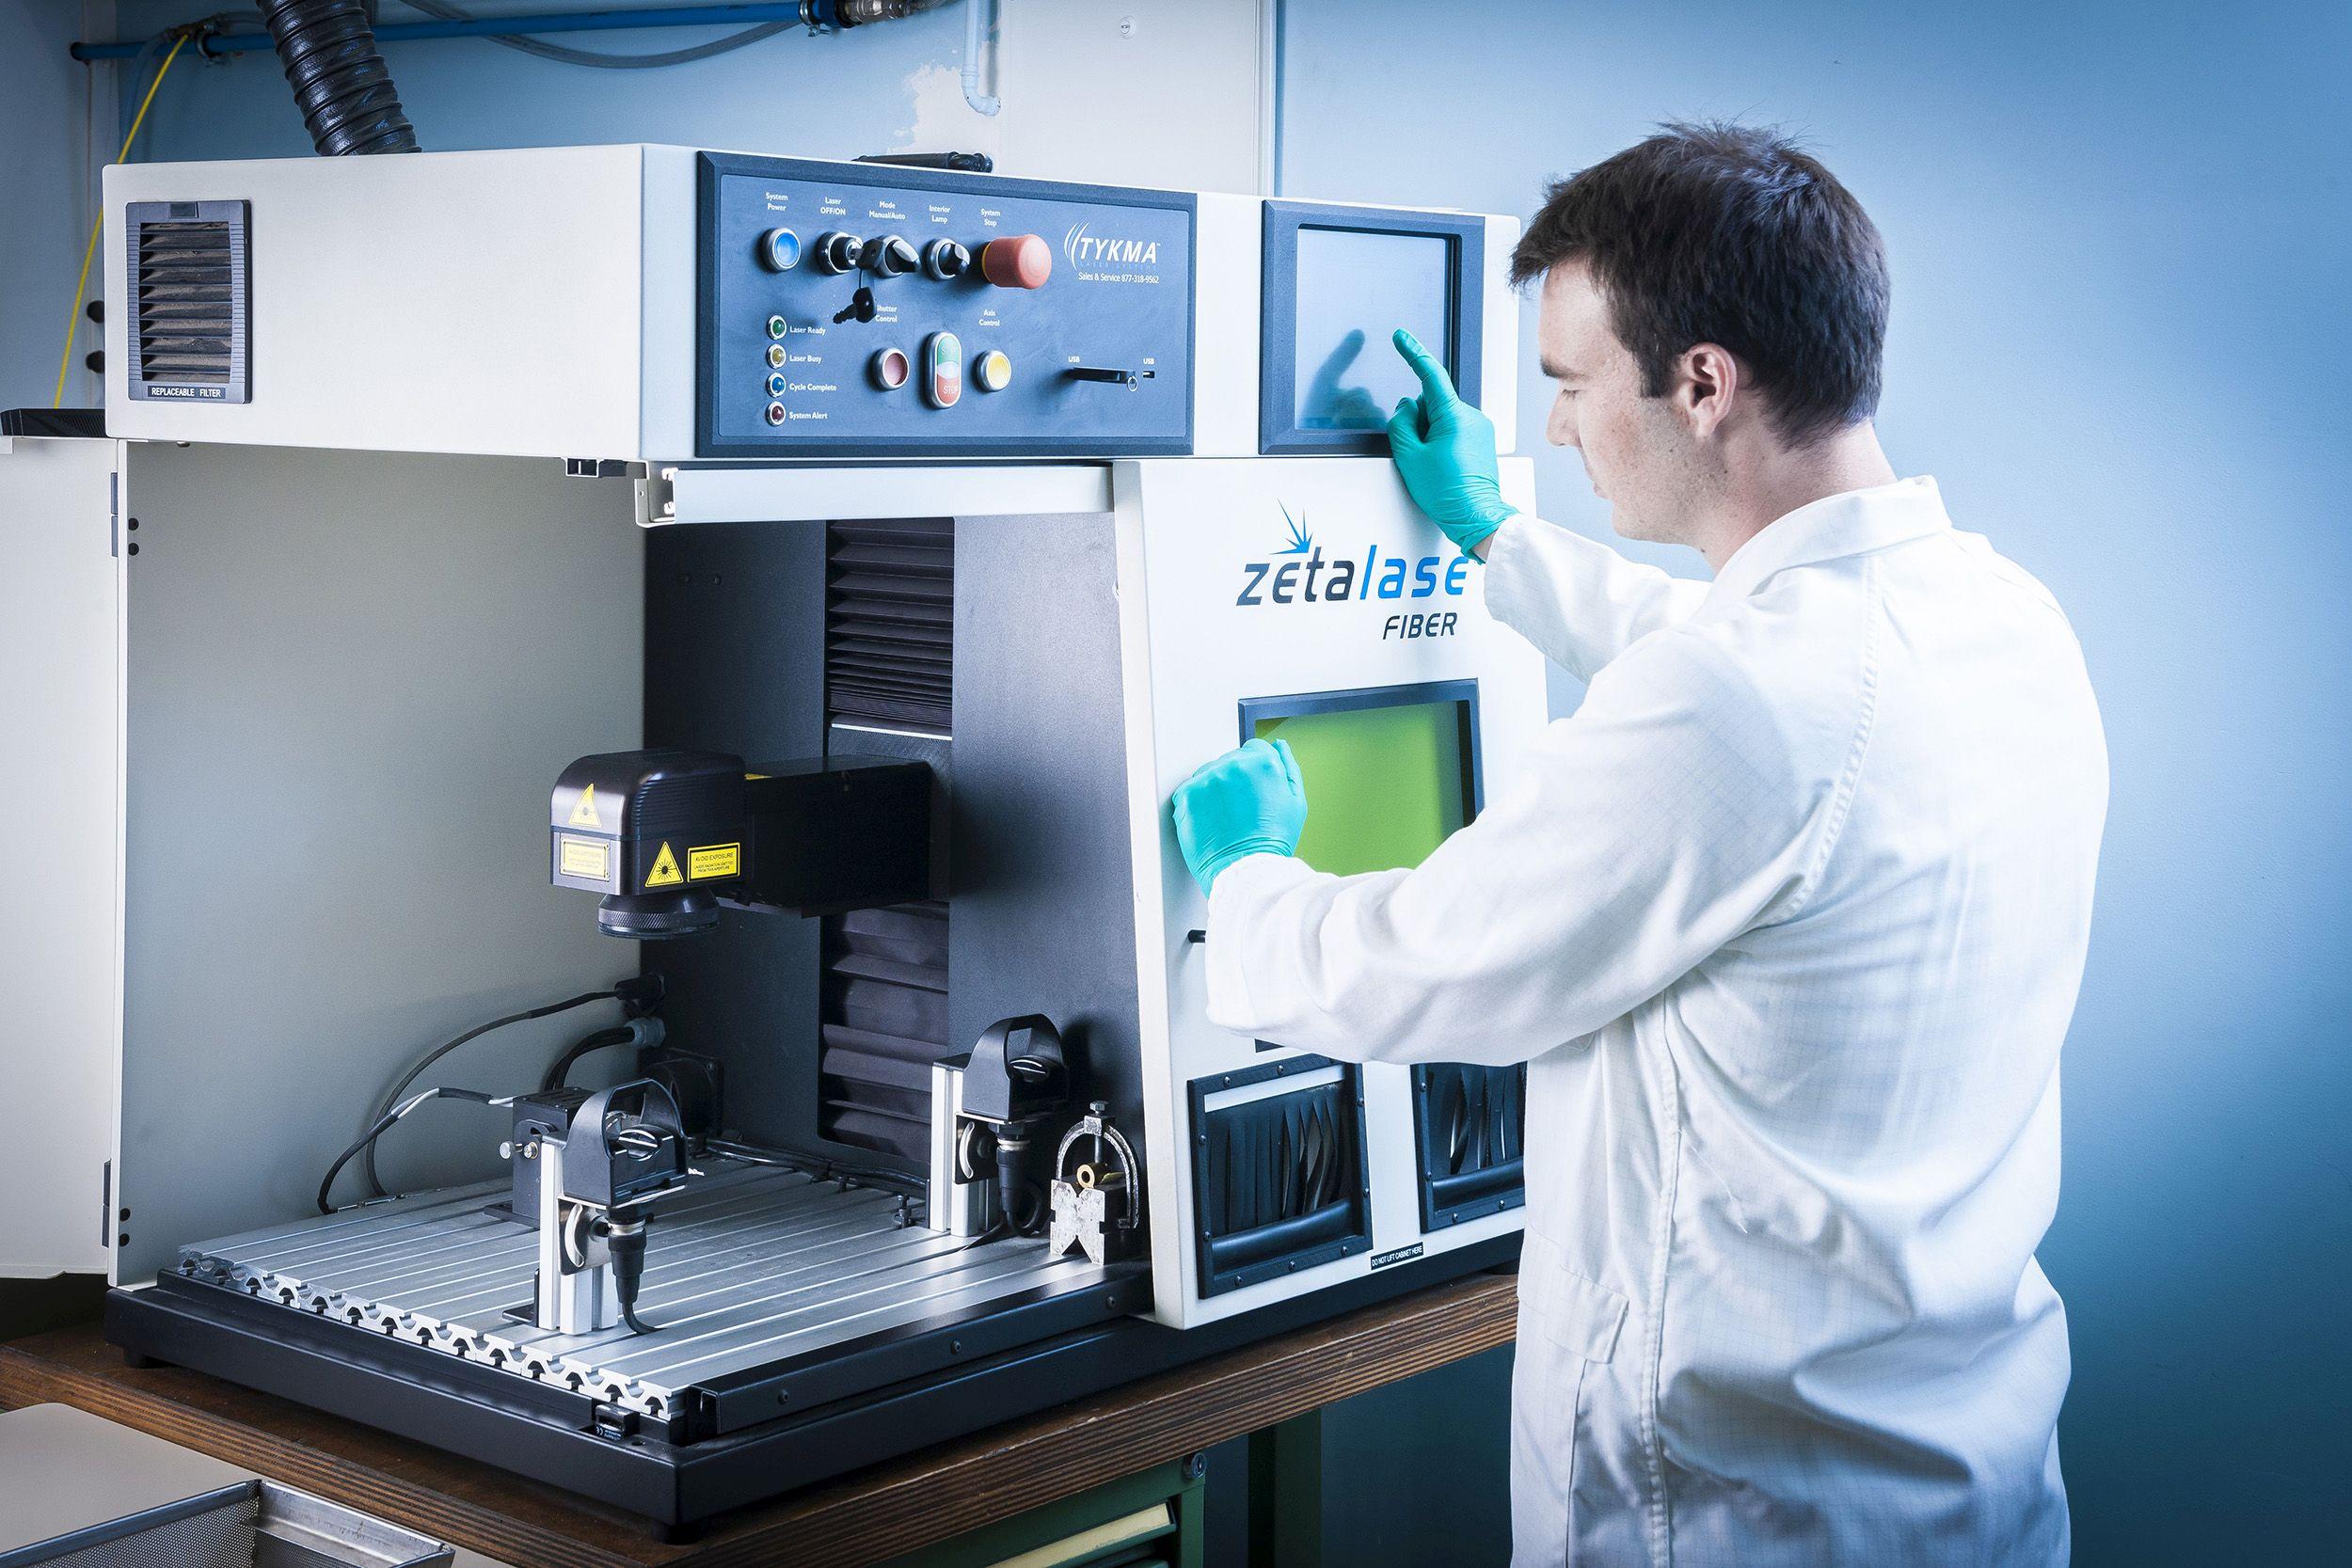 Precxis outils dentaires et medicaux - Marquage laser